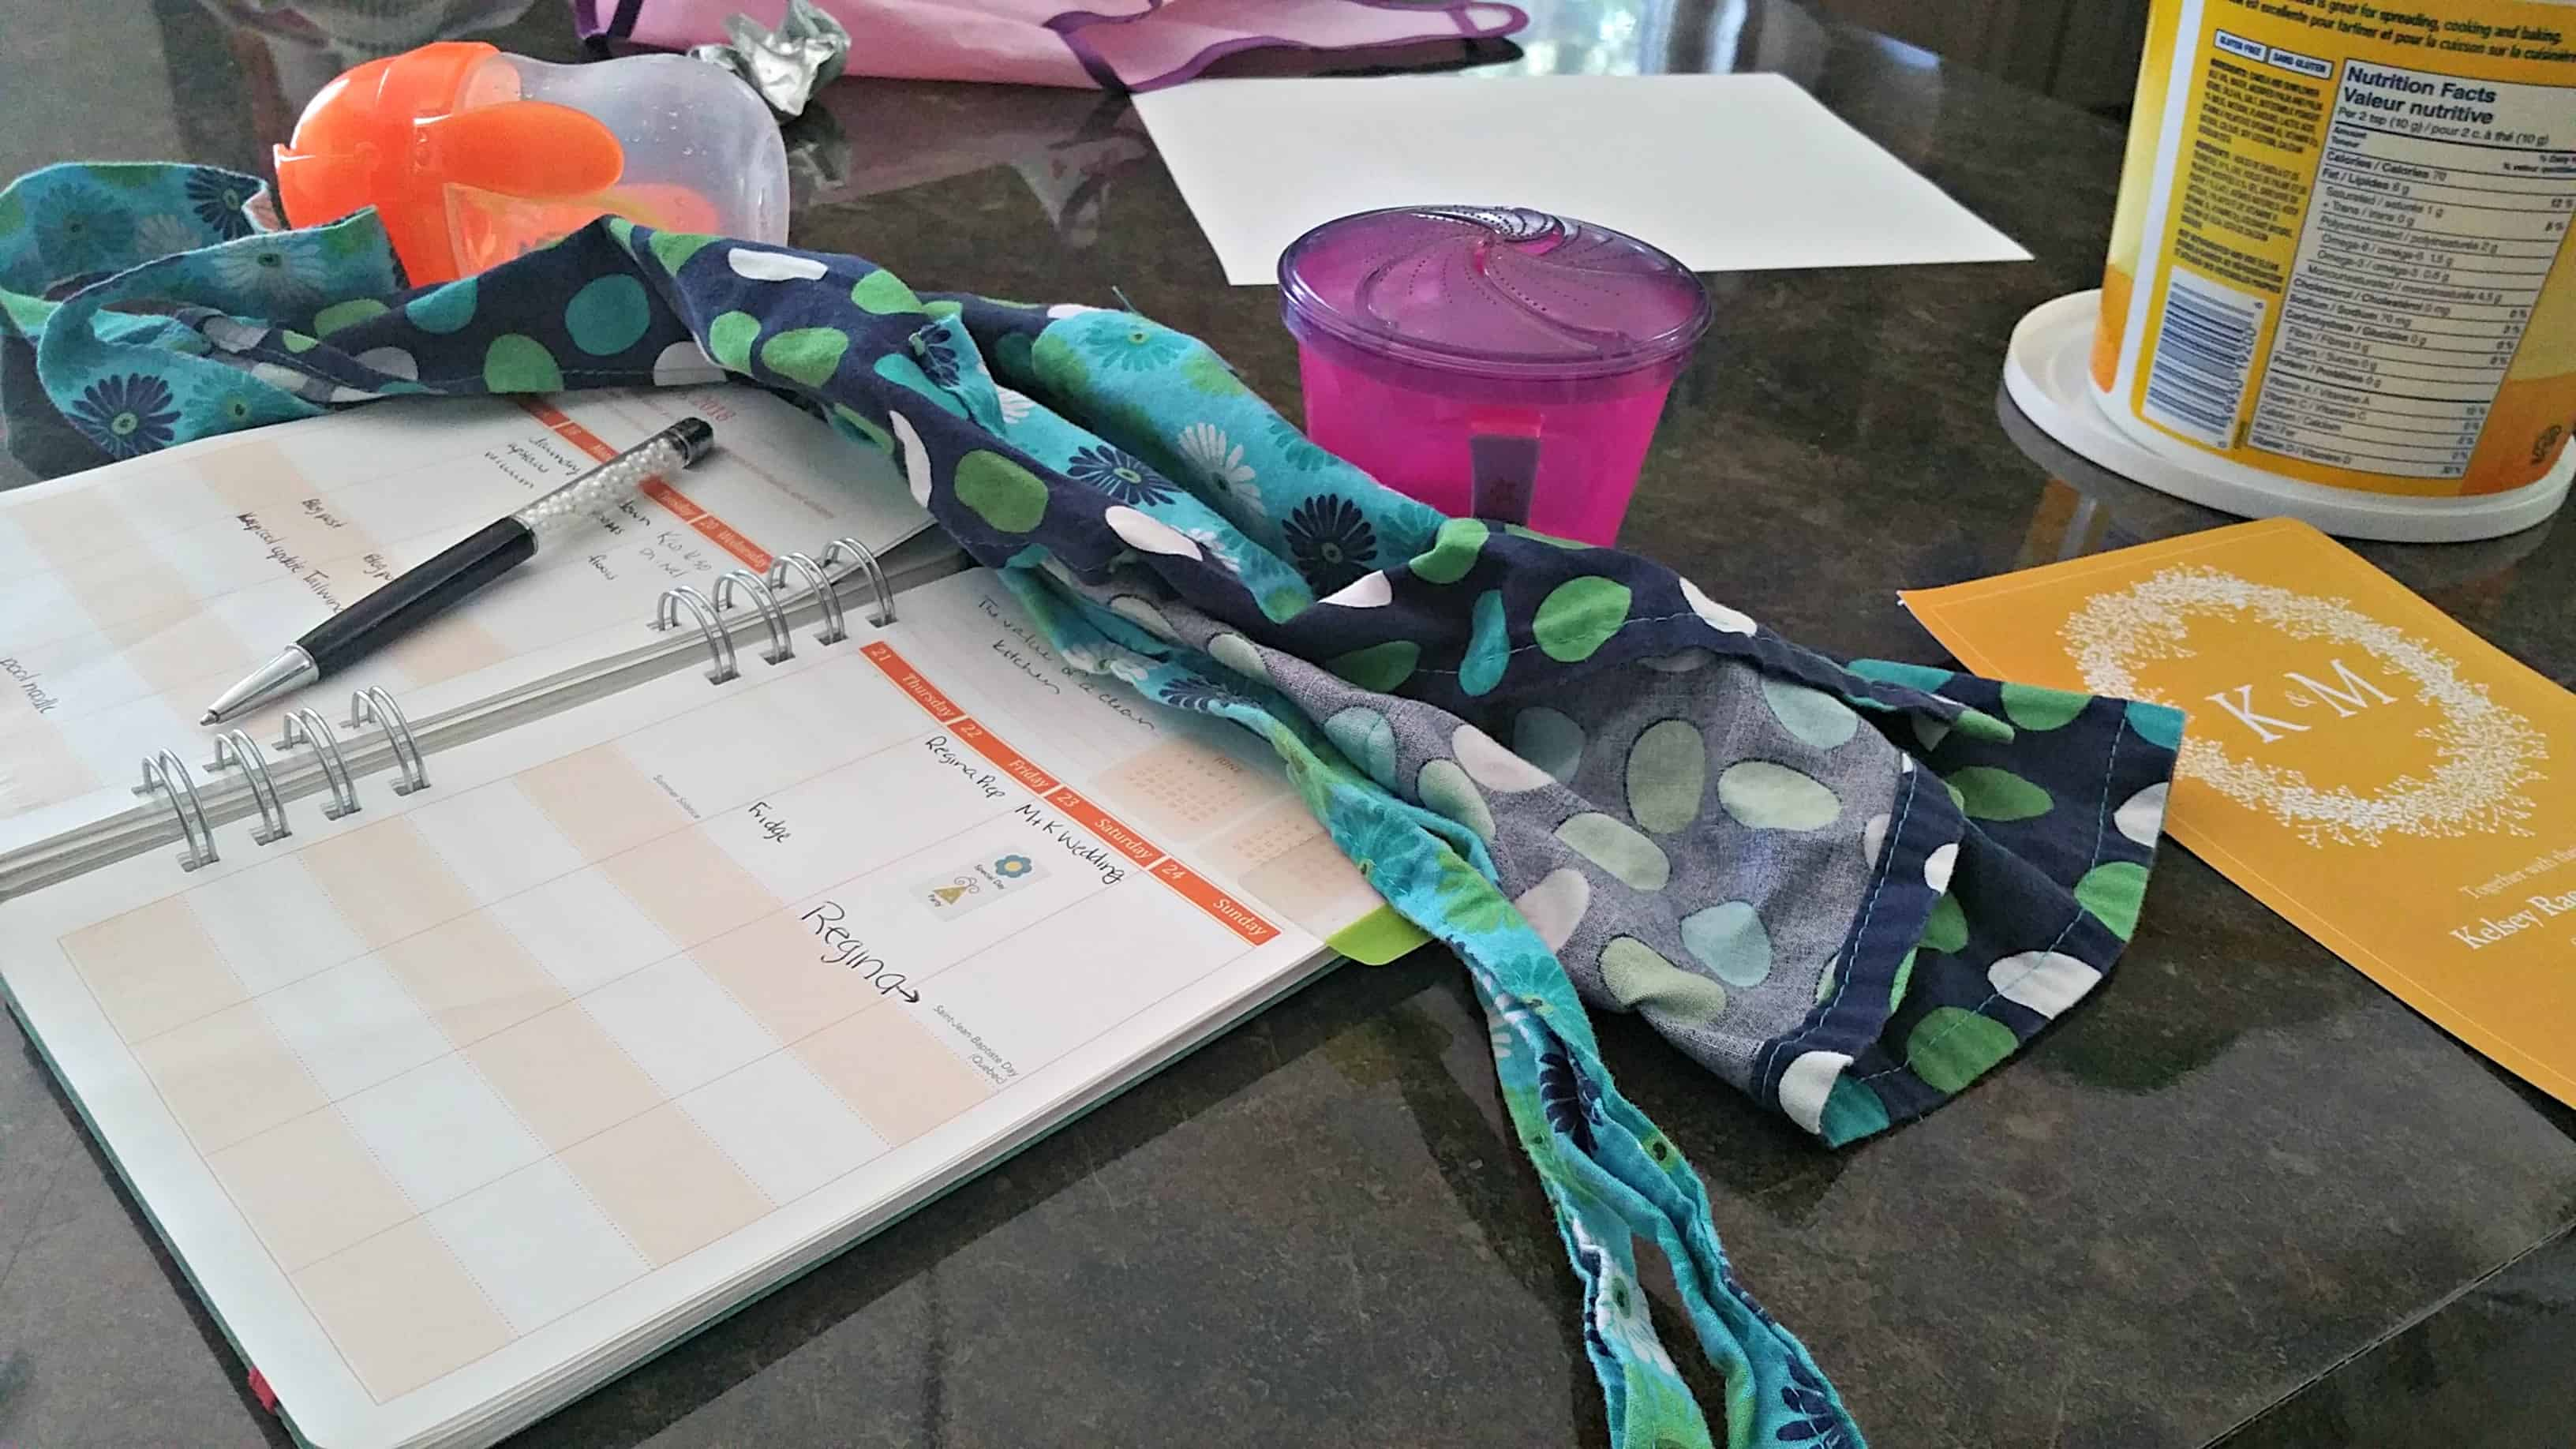 Increase Productivity As A Homemaker And Maximize Efficiencies